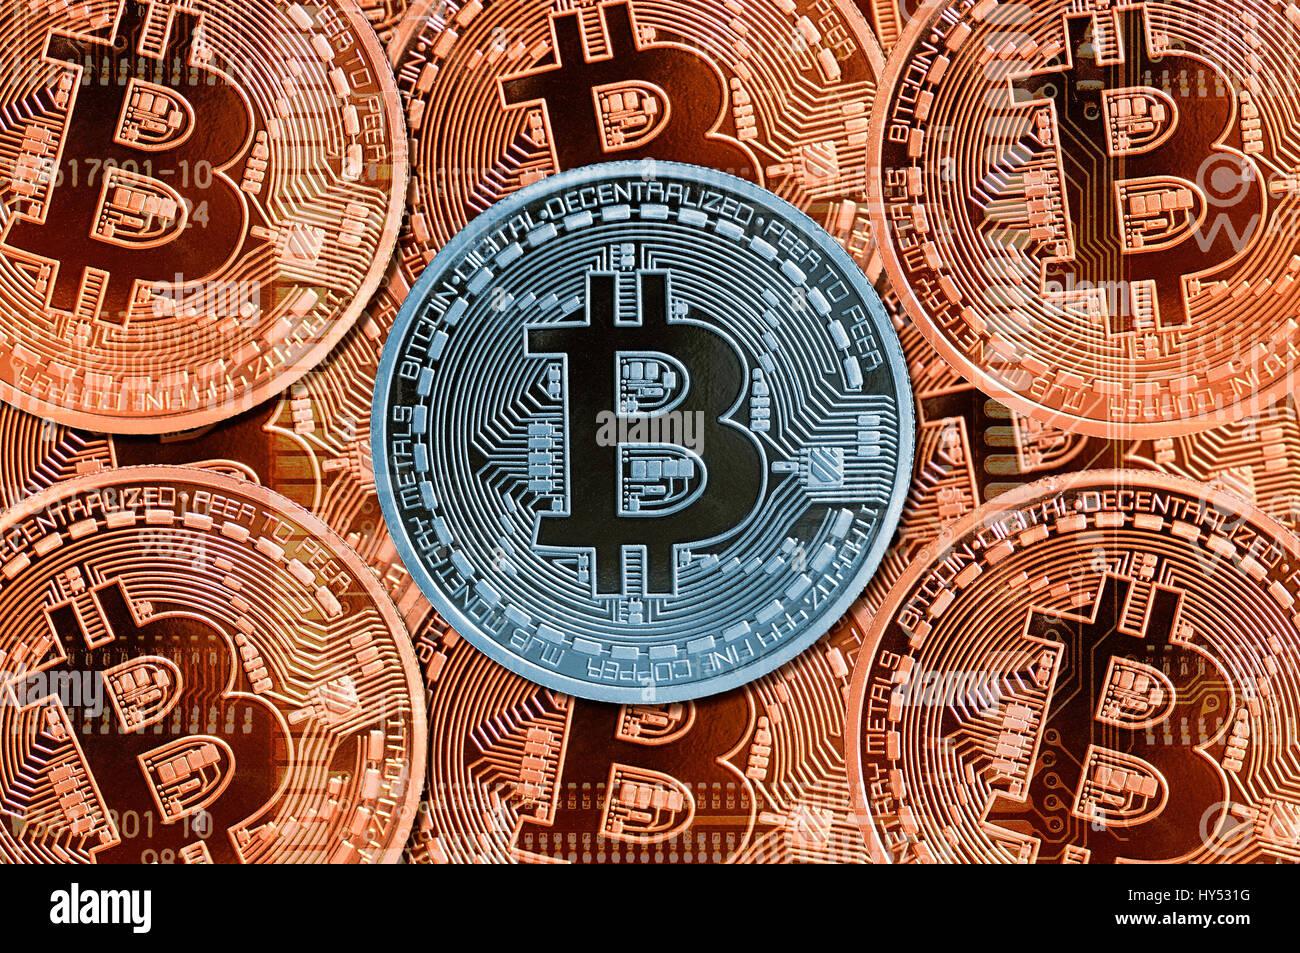 Valuta digitale - Bitcoin, Digitale Waehrung - Bitcoin Immagini Stock